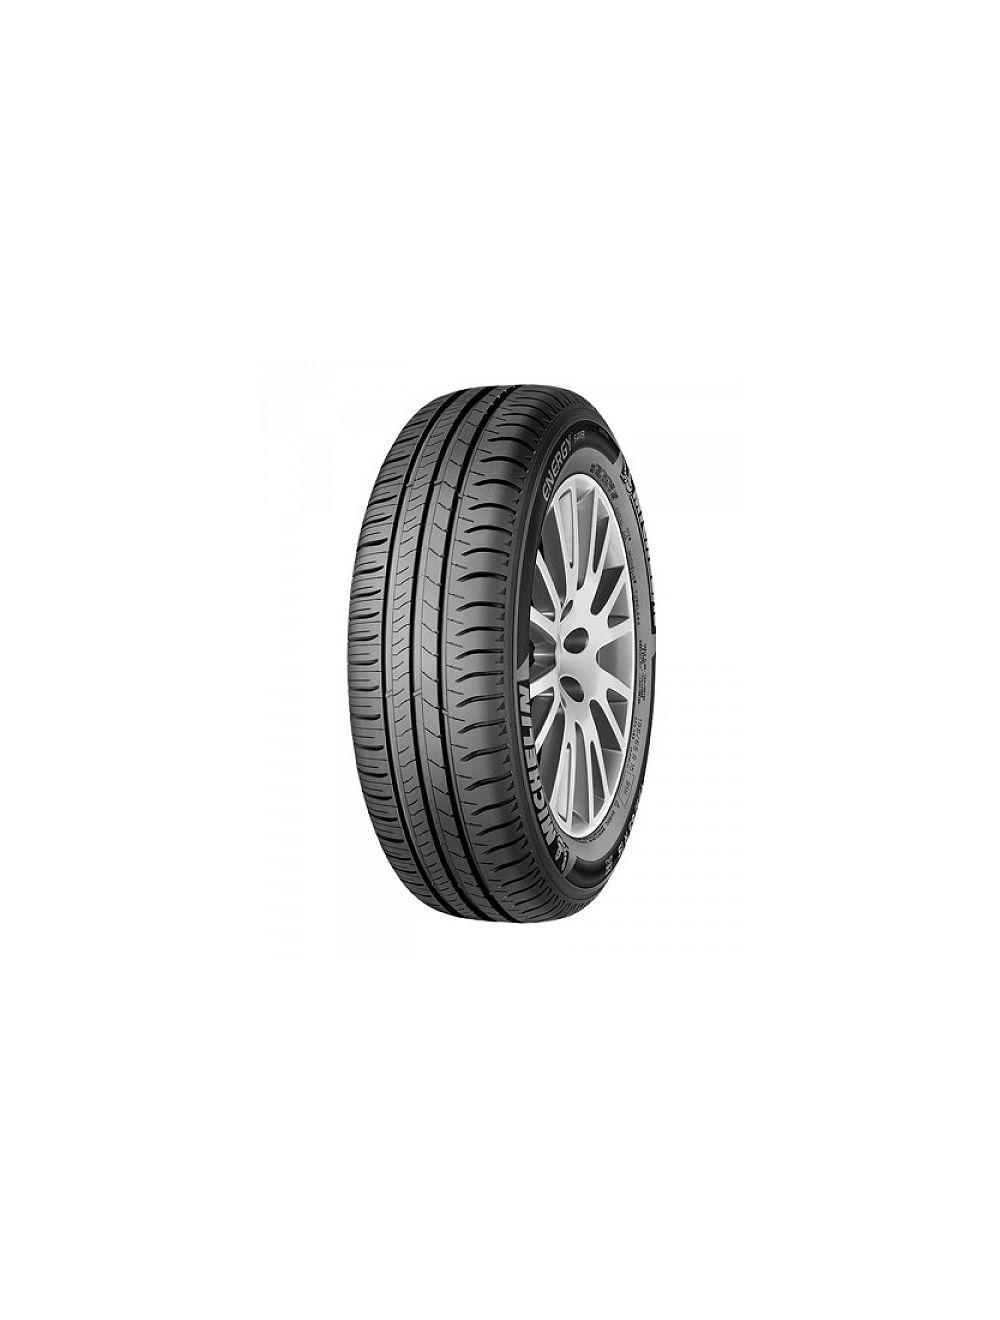 Michelin 165/70R14 T Energy Saver+ Grnx Nyári gumi